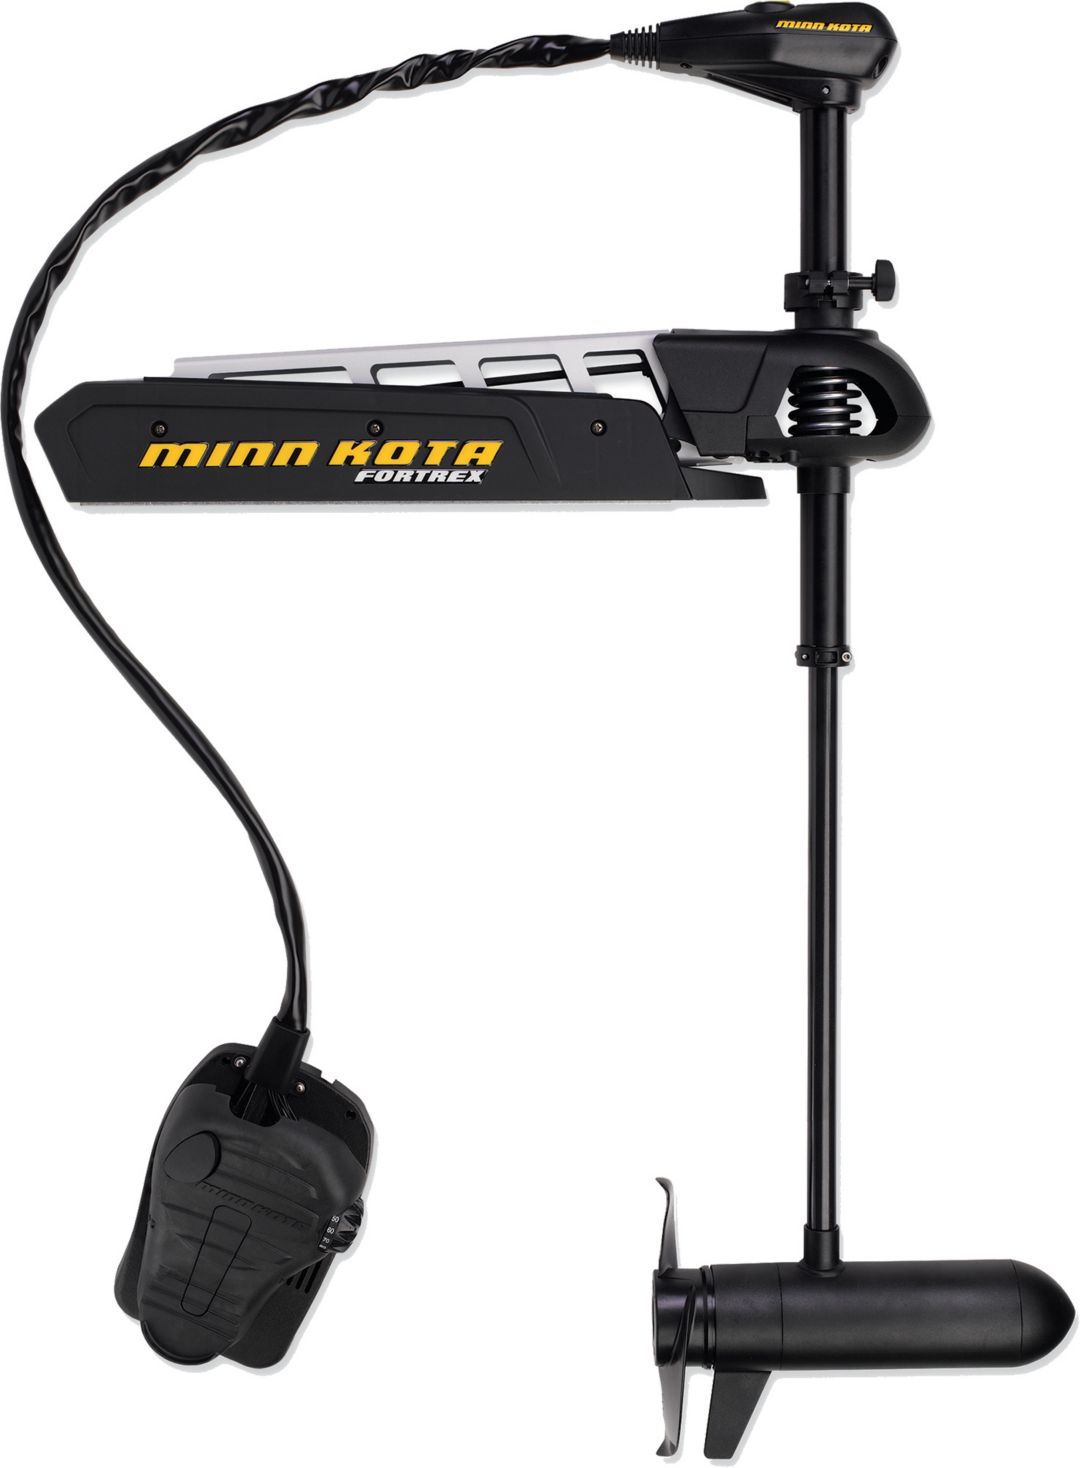 Minn Kota Trolling Motor >> Minn Kota Fortrex 80 Lb 45 Freshwater Bow Mount Trolling Motor